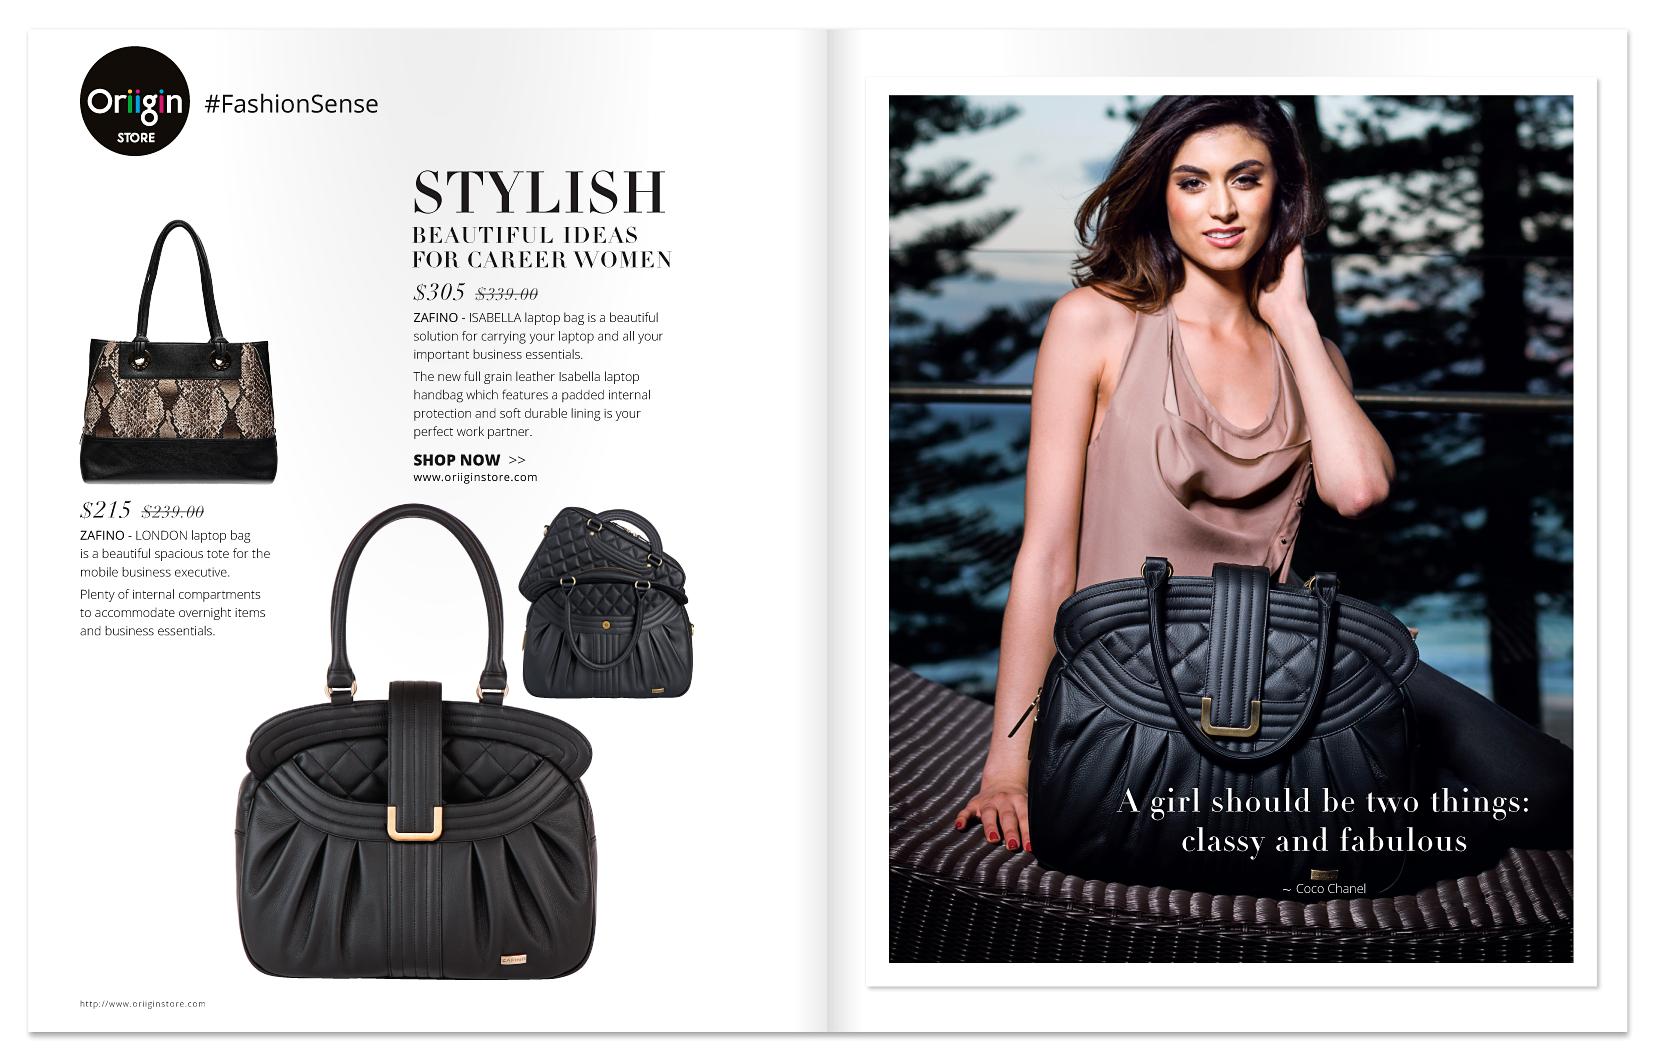 stylish beautiful ideas for career women. stylish fashion ad for